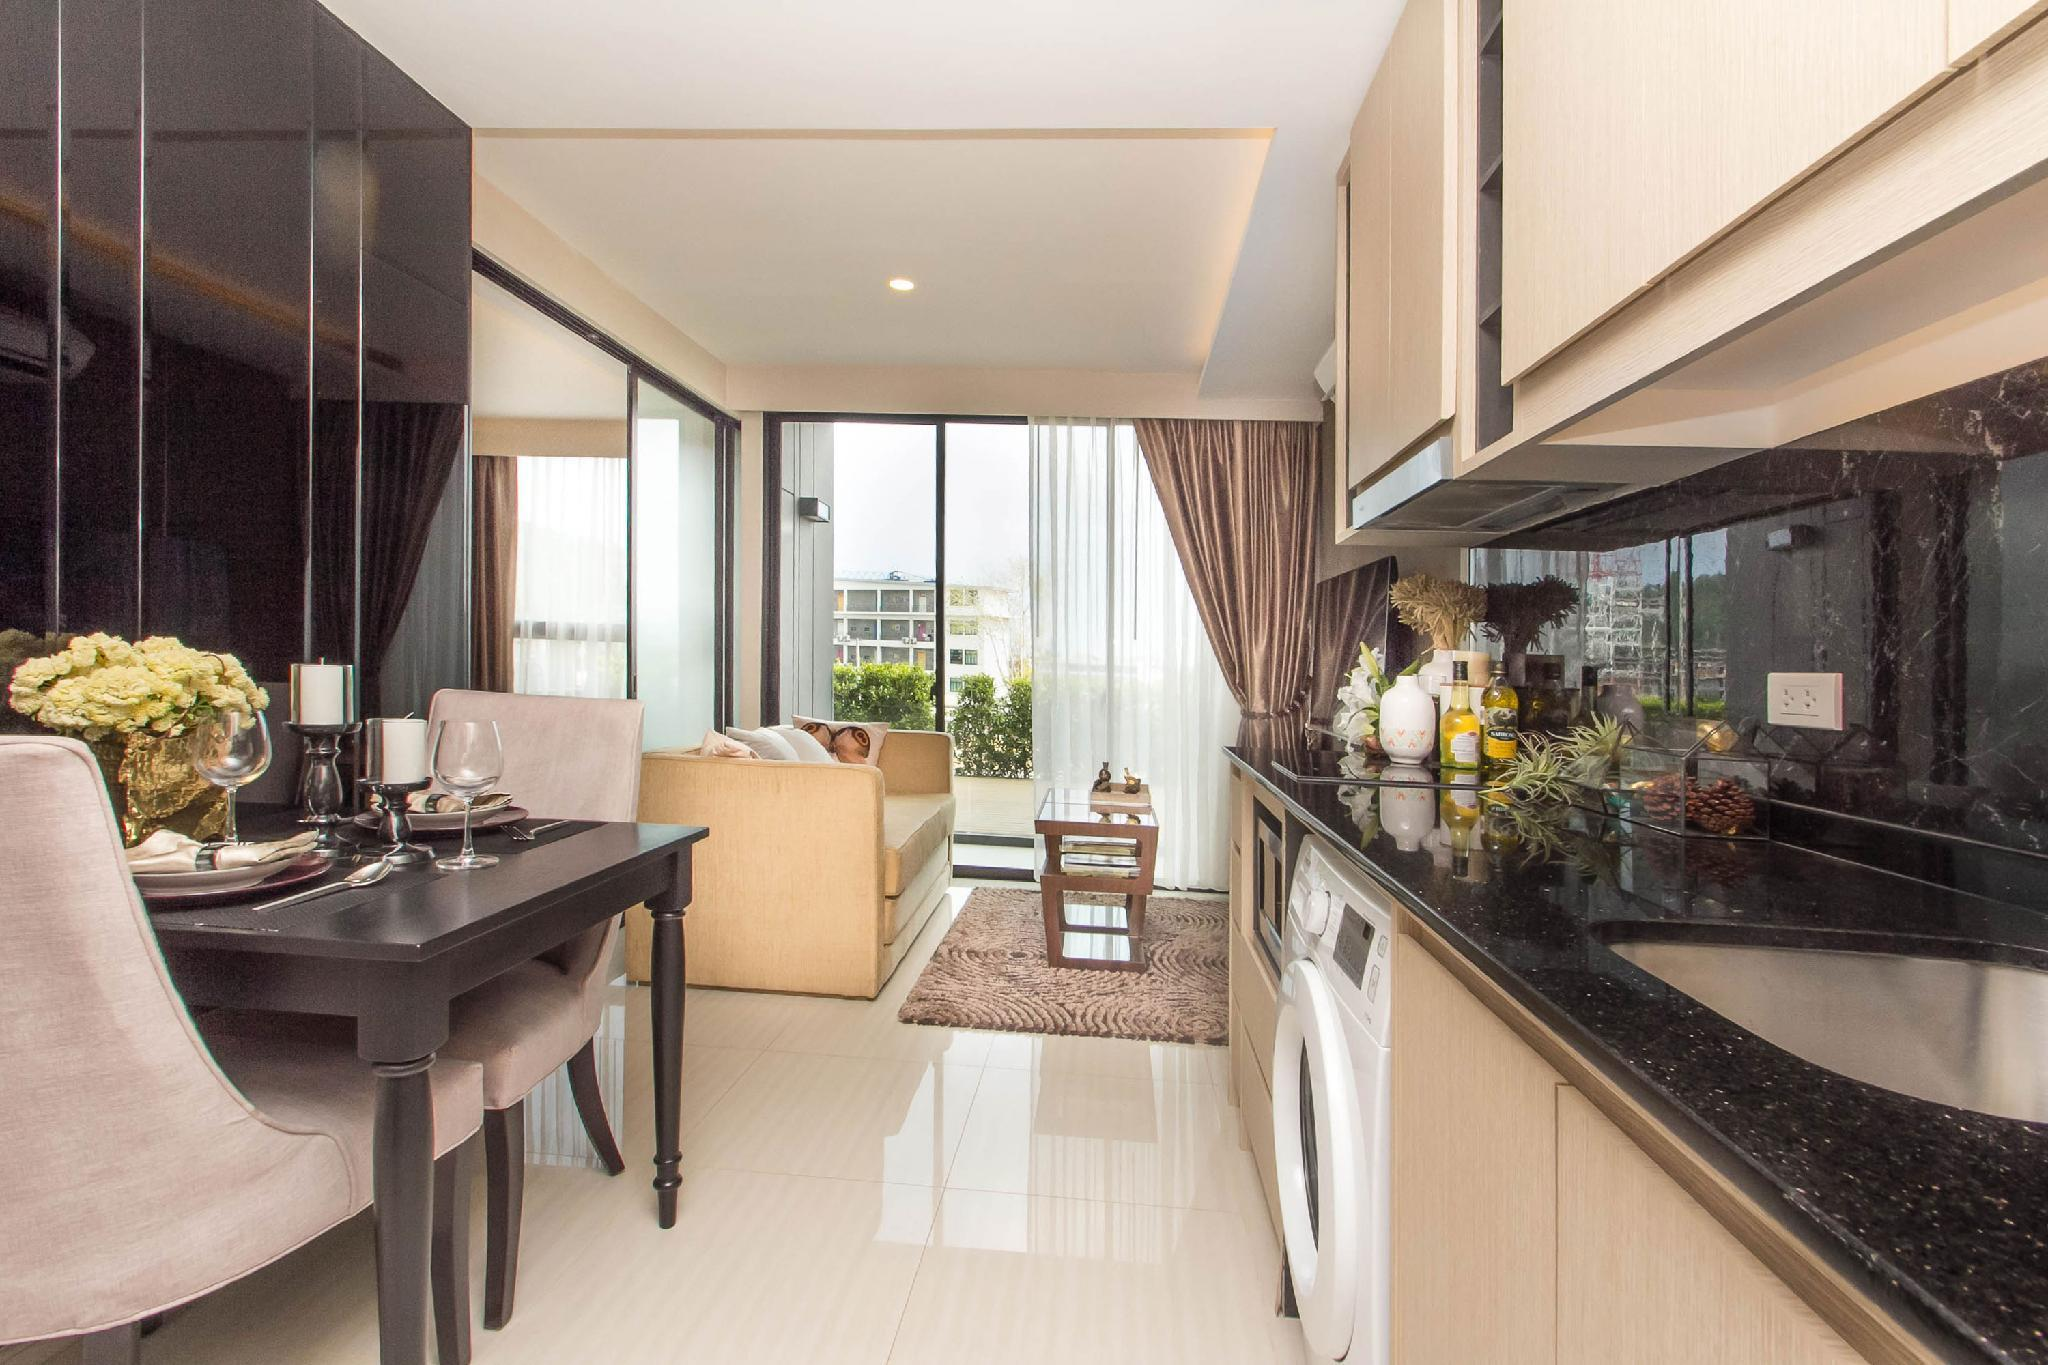 Stylish Panora apartment 5 min walk to Surin Beach อพาร์ตเมนต์ 1 ห้องนอน 1 ห้องน้ำส่วนตัว ขนาด 47 ตร.ม. – สุรินทร์